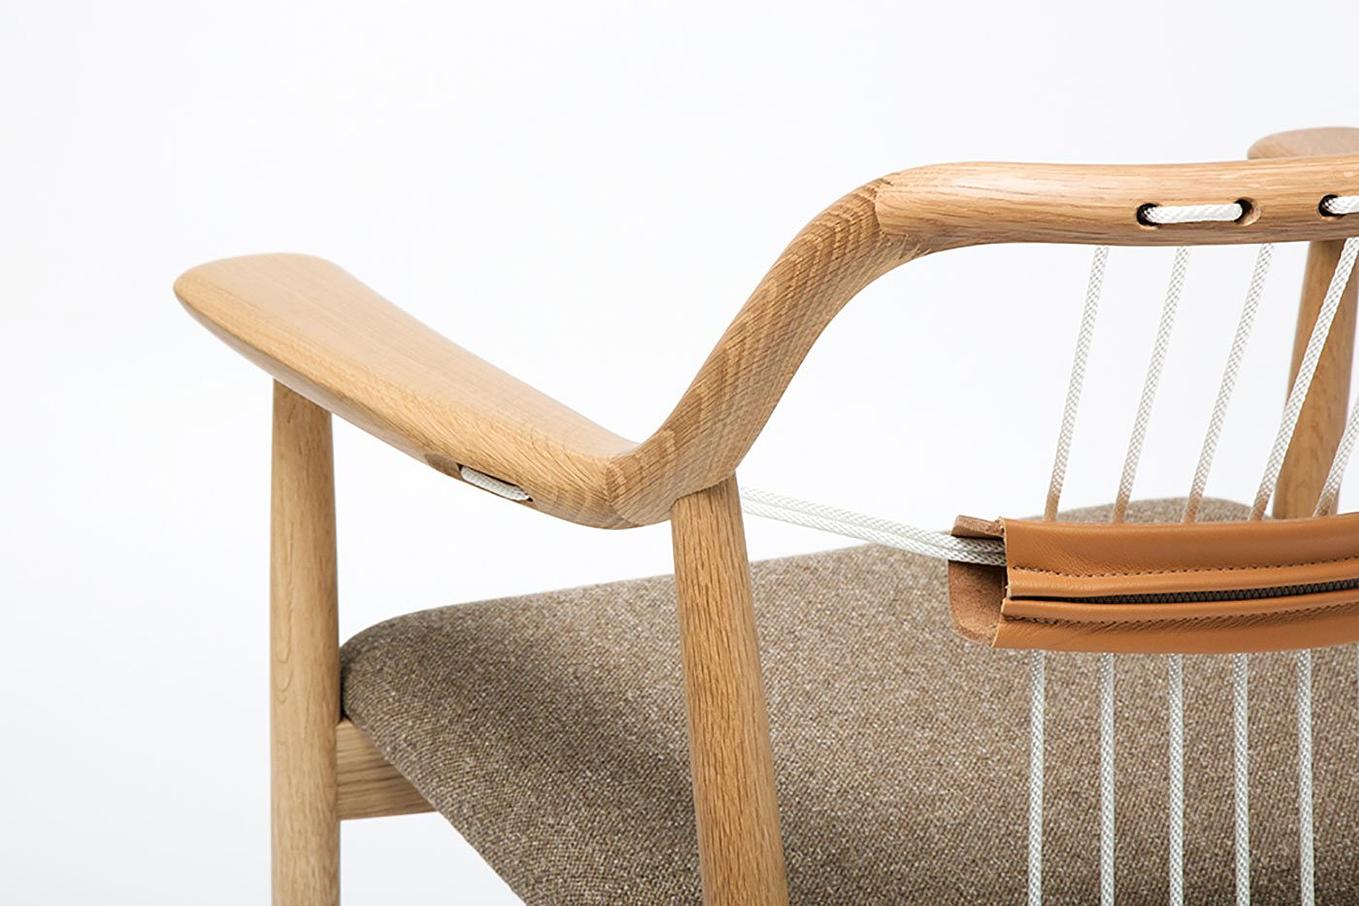 yc1-chair-by-mikiya-kobayashi-10